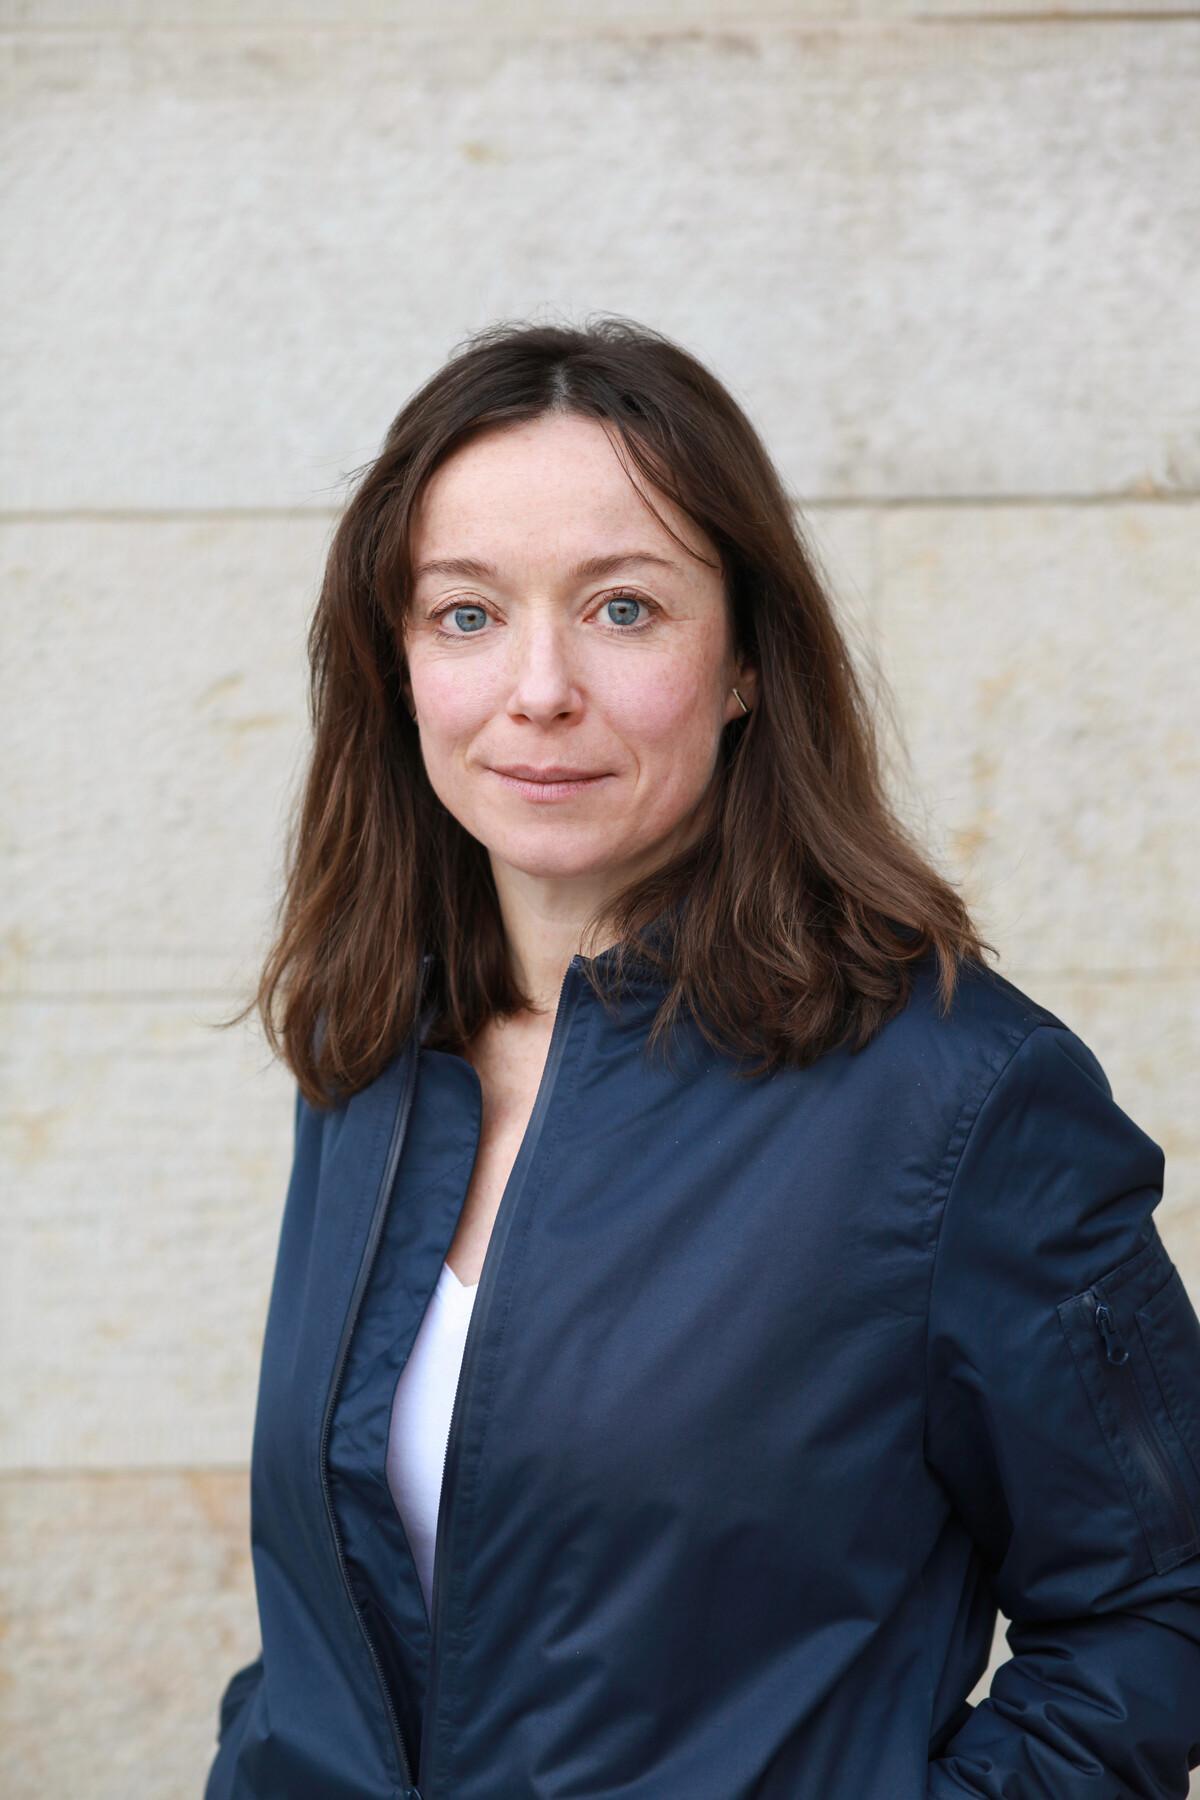 Portrait Franciska Zólyom, Foto Julia Rößner, 2018